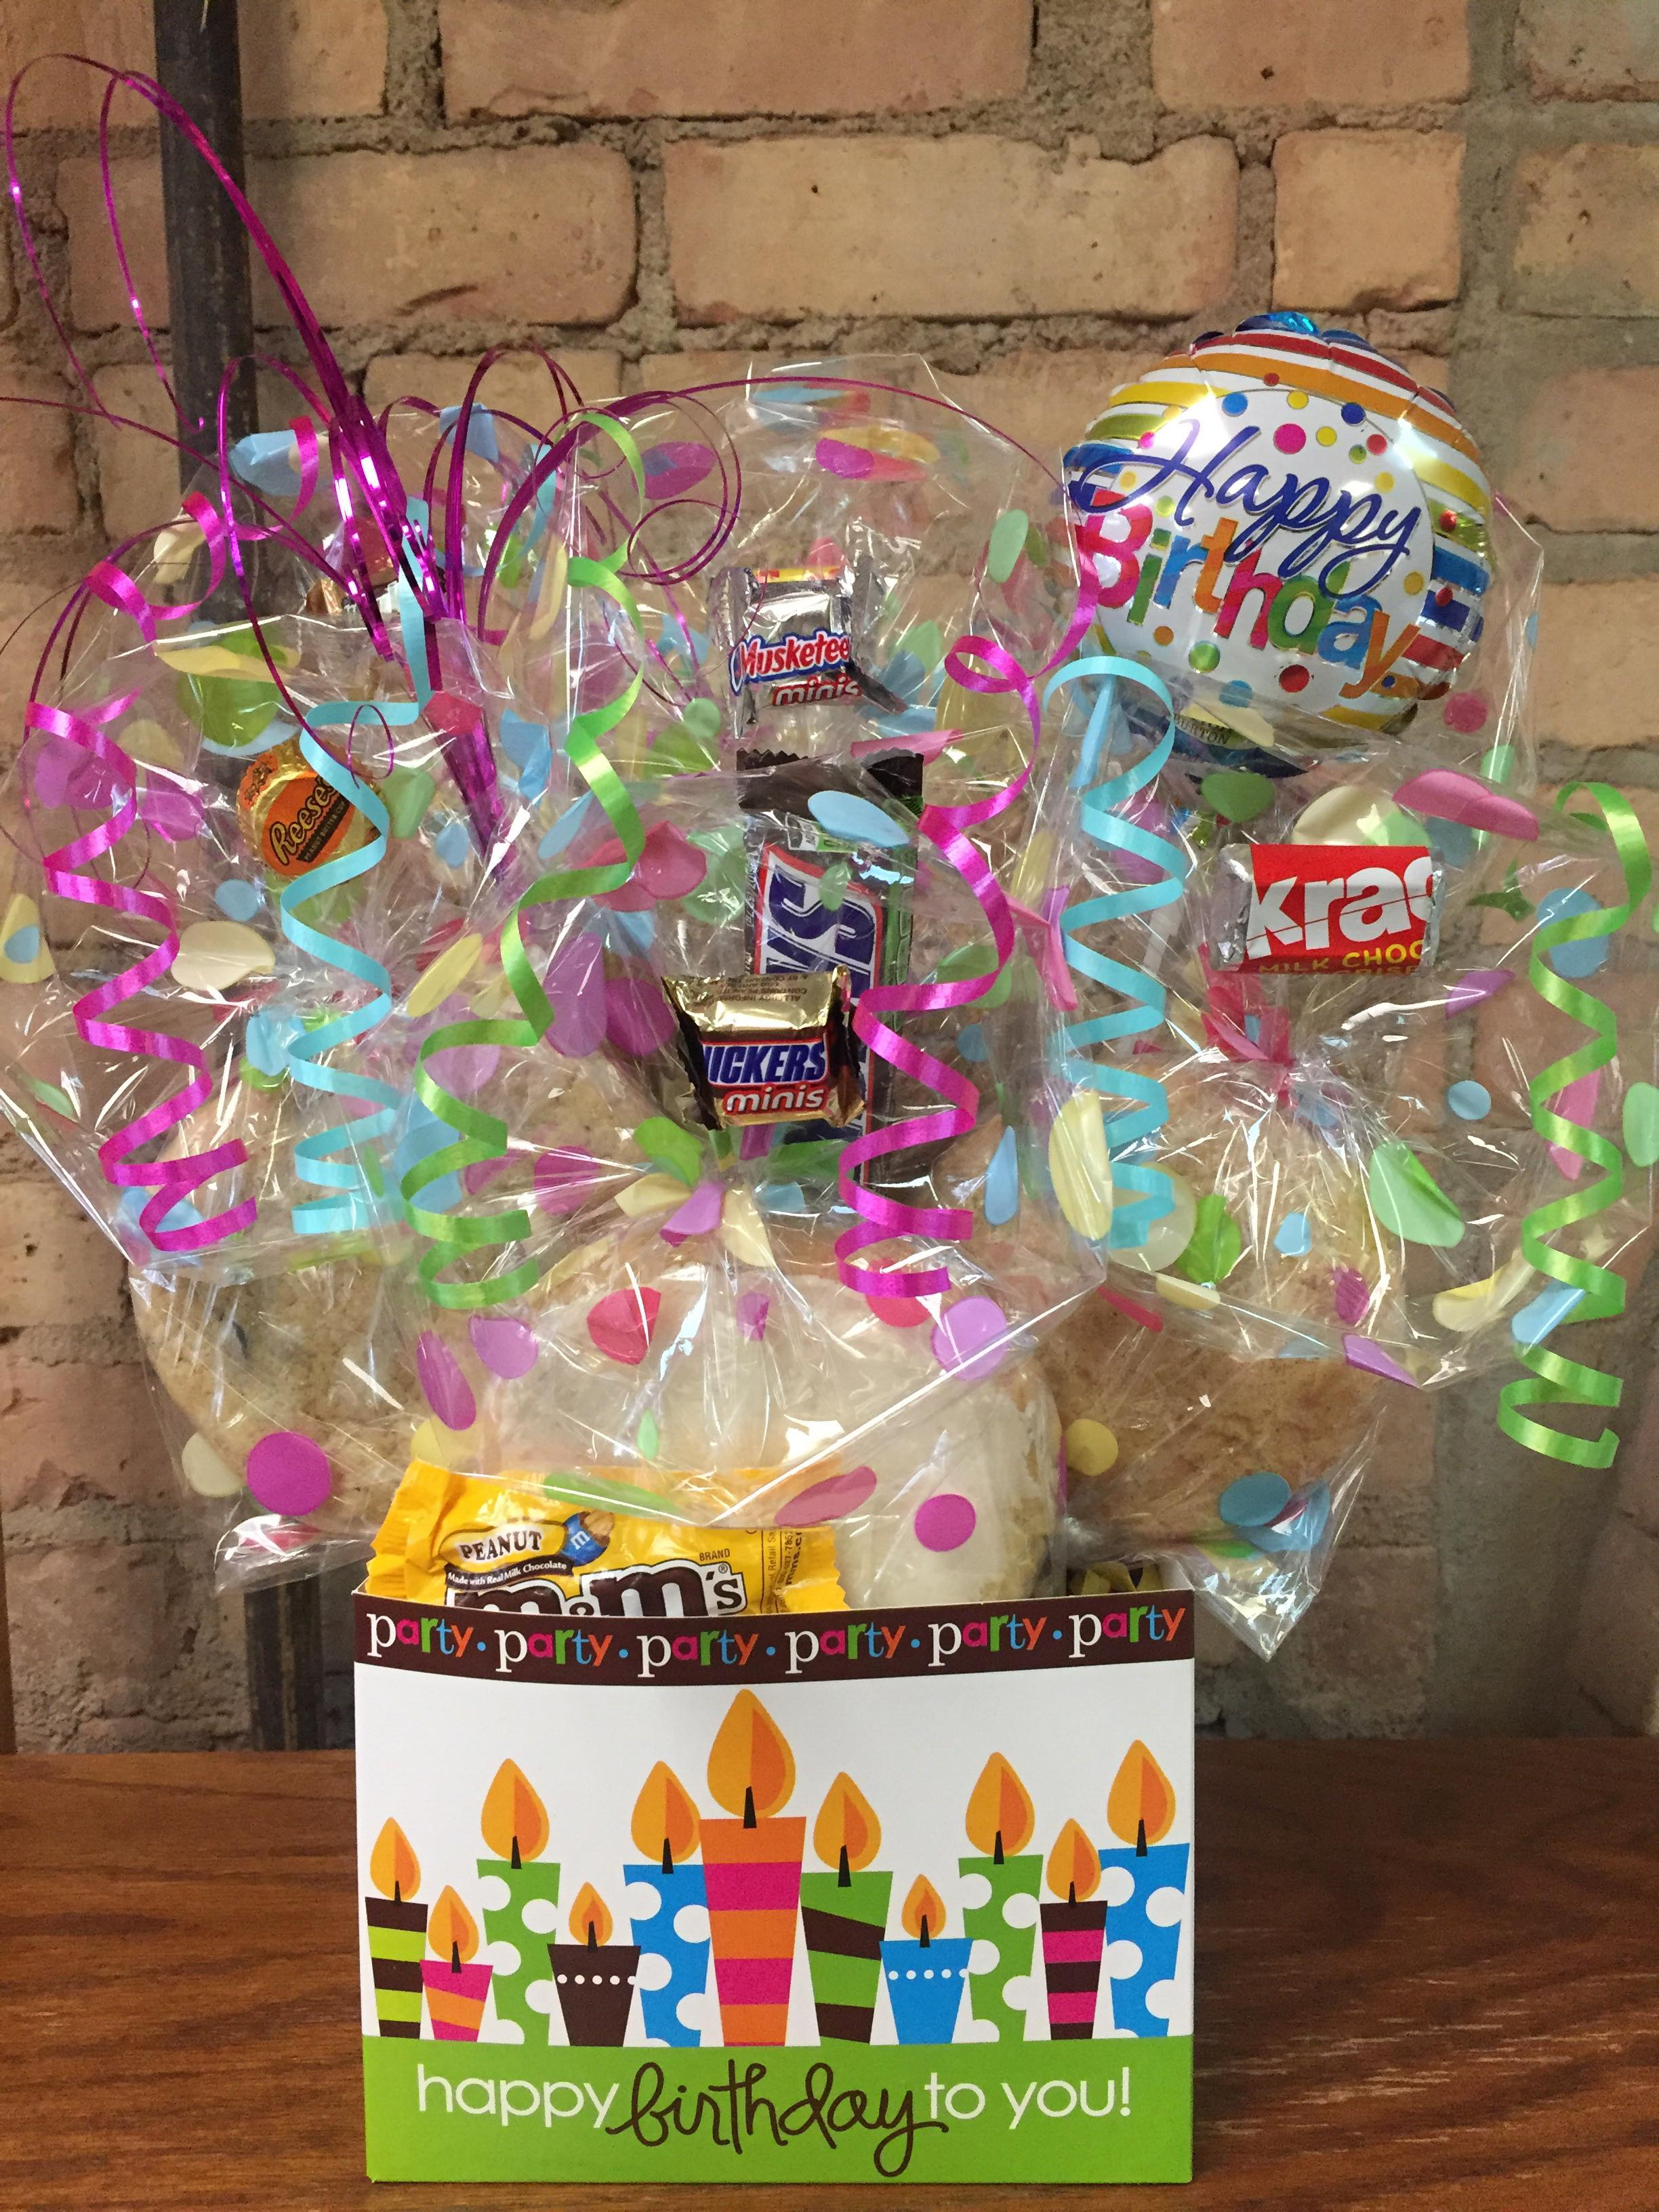 Happy Birthday Lime Box Cookie Bouquet